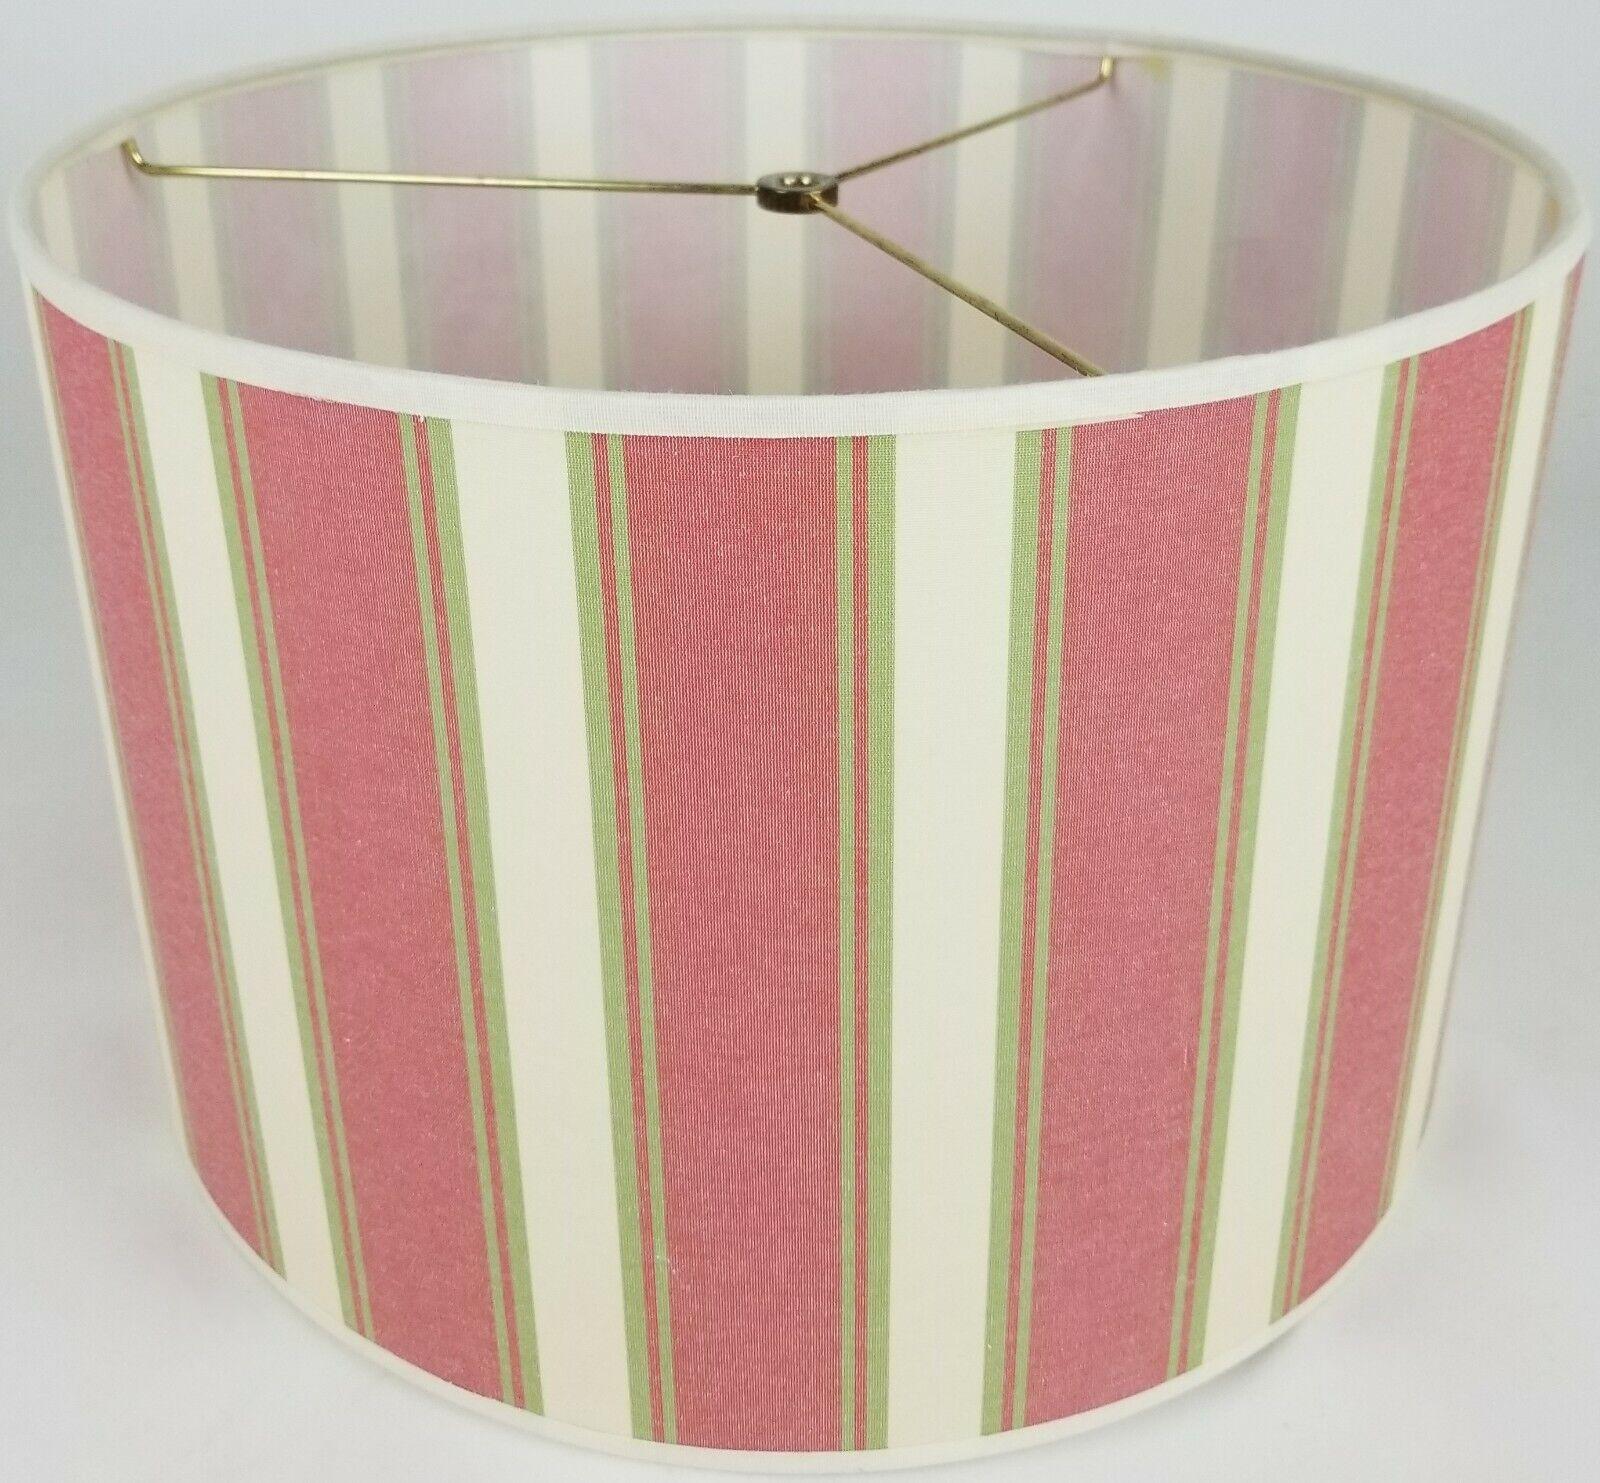 "NEW Drum Lamp Shade 15"" Dia 10"" H Pink Green Verticle Stripe"